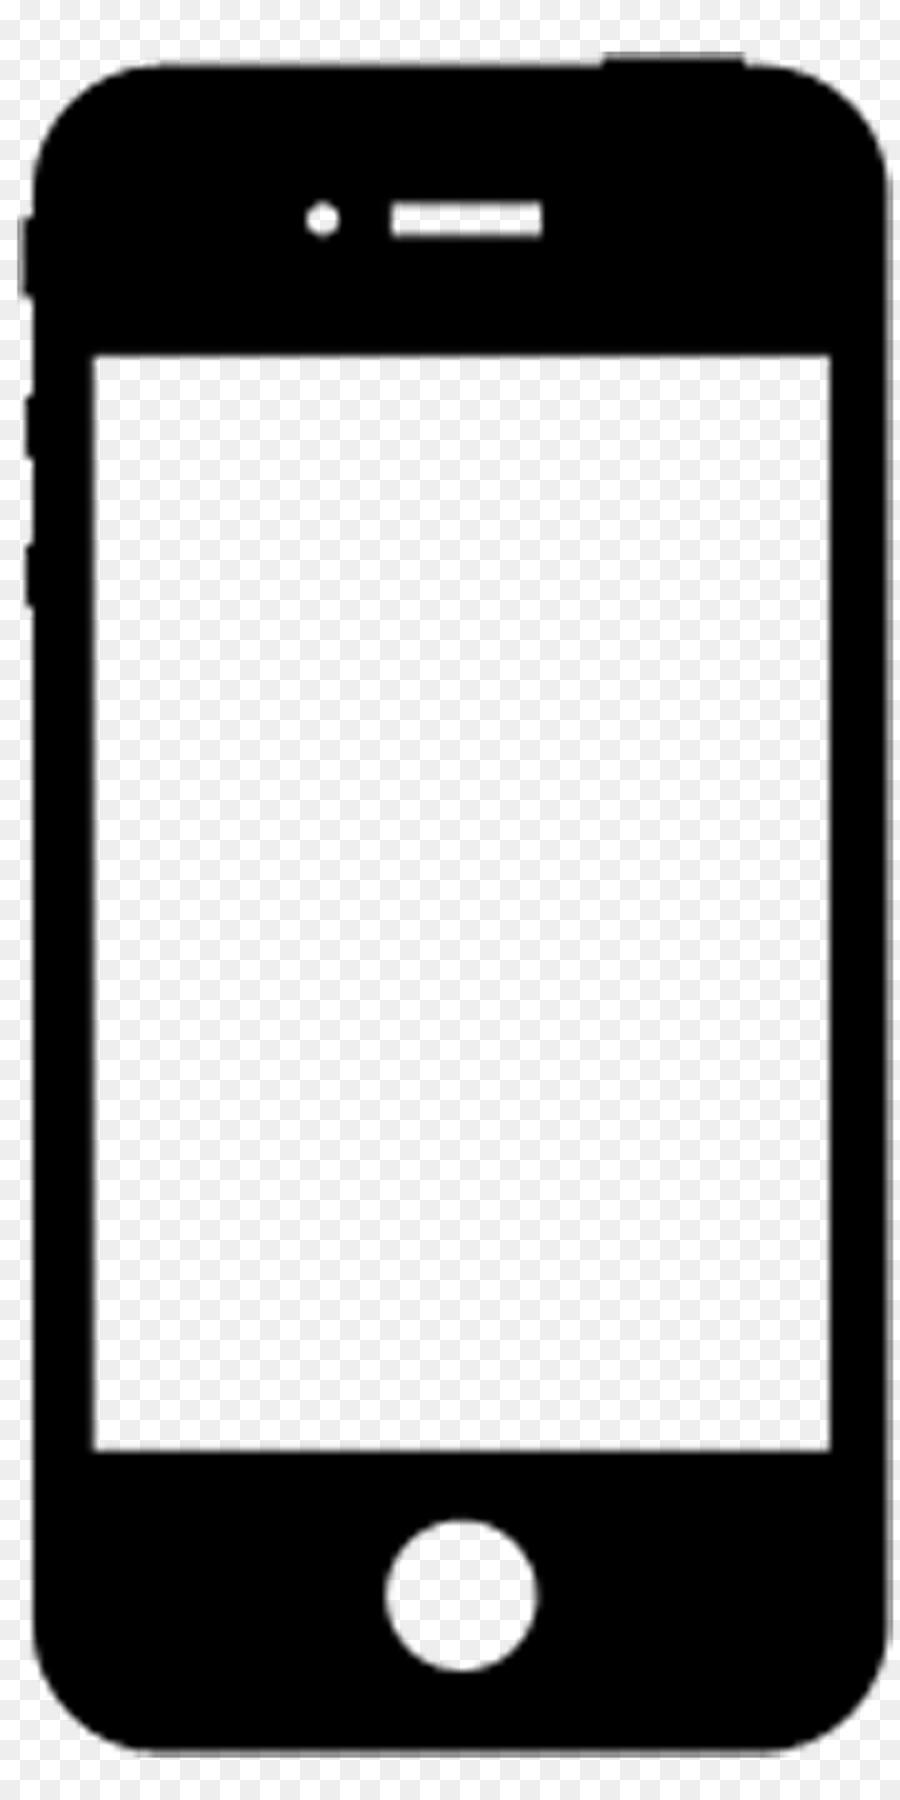 Iphone 4s iphone 8 template venkateswara png download 17723543 iphone 4s iphone 8 template venkateswara maxwellsz